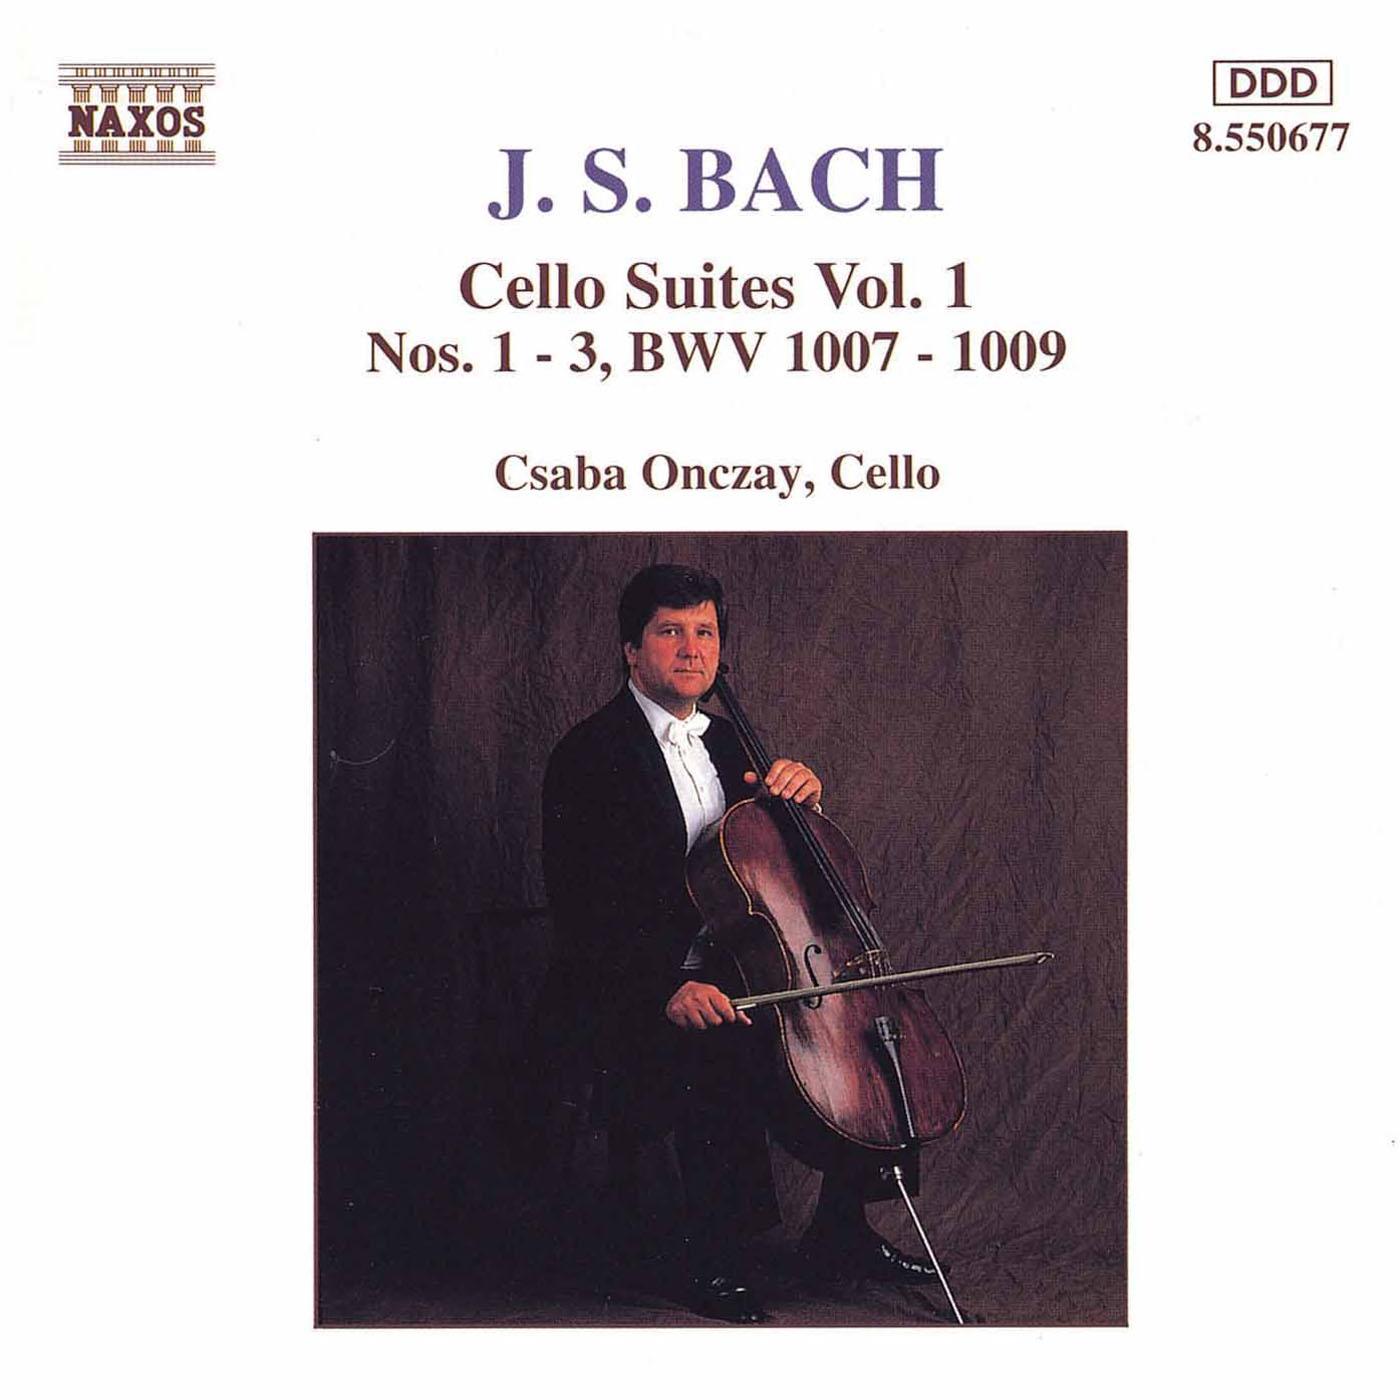 Bach, J.S.: Cello Suites Nos. 1-3, Bwv 1007-1009